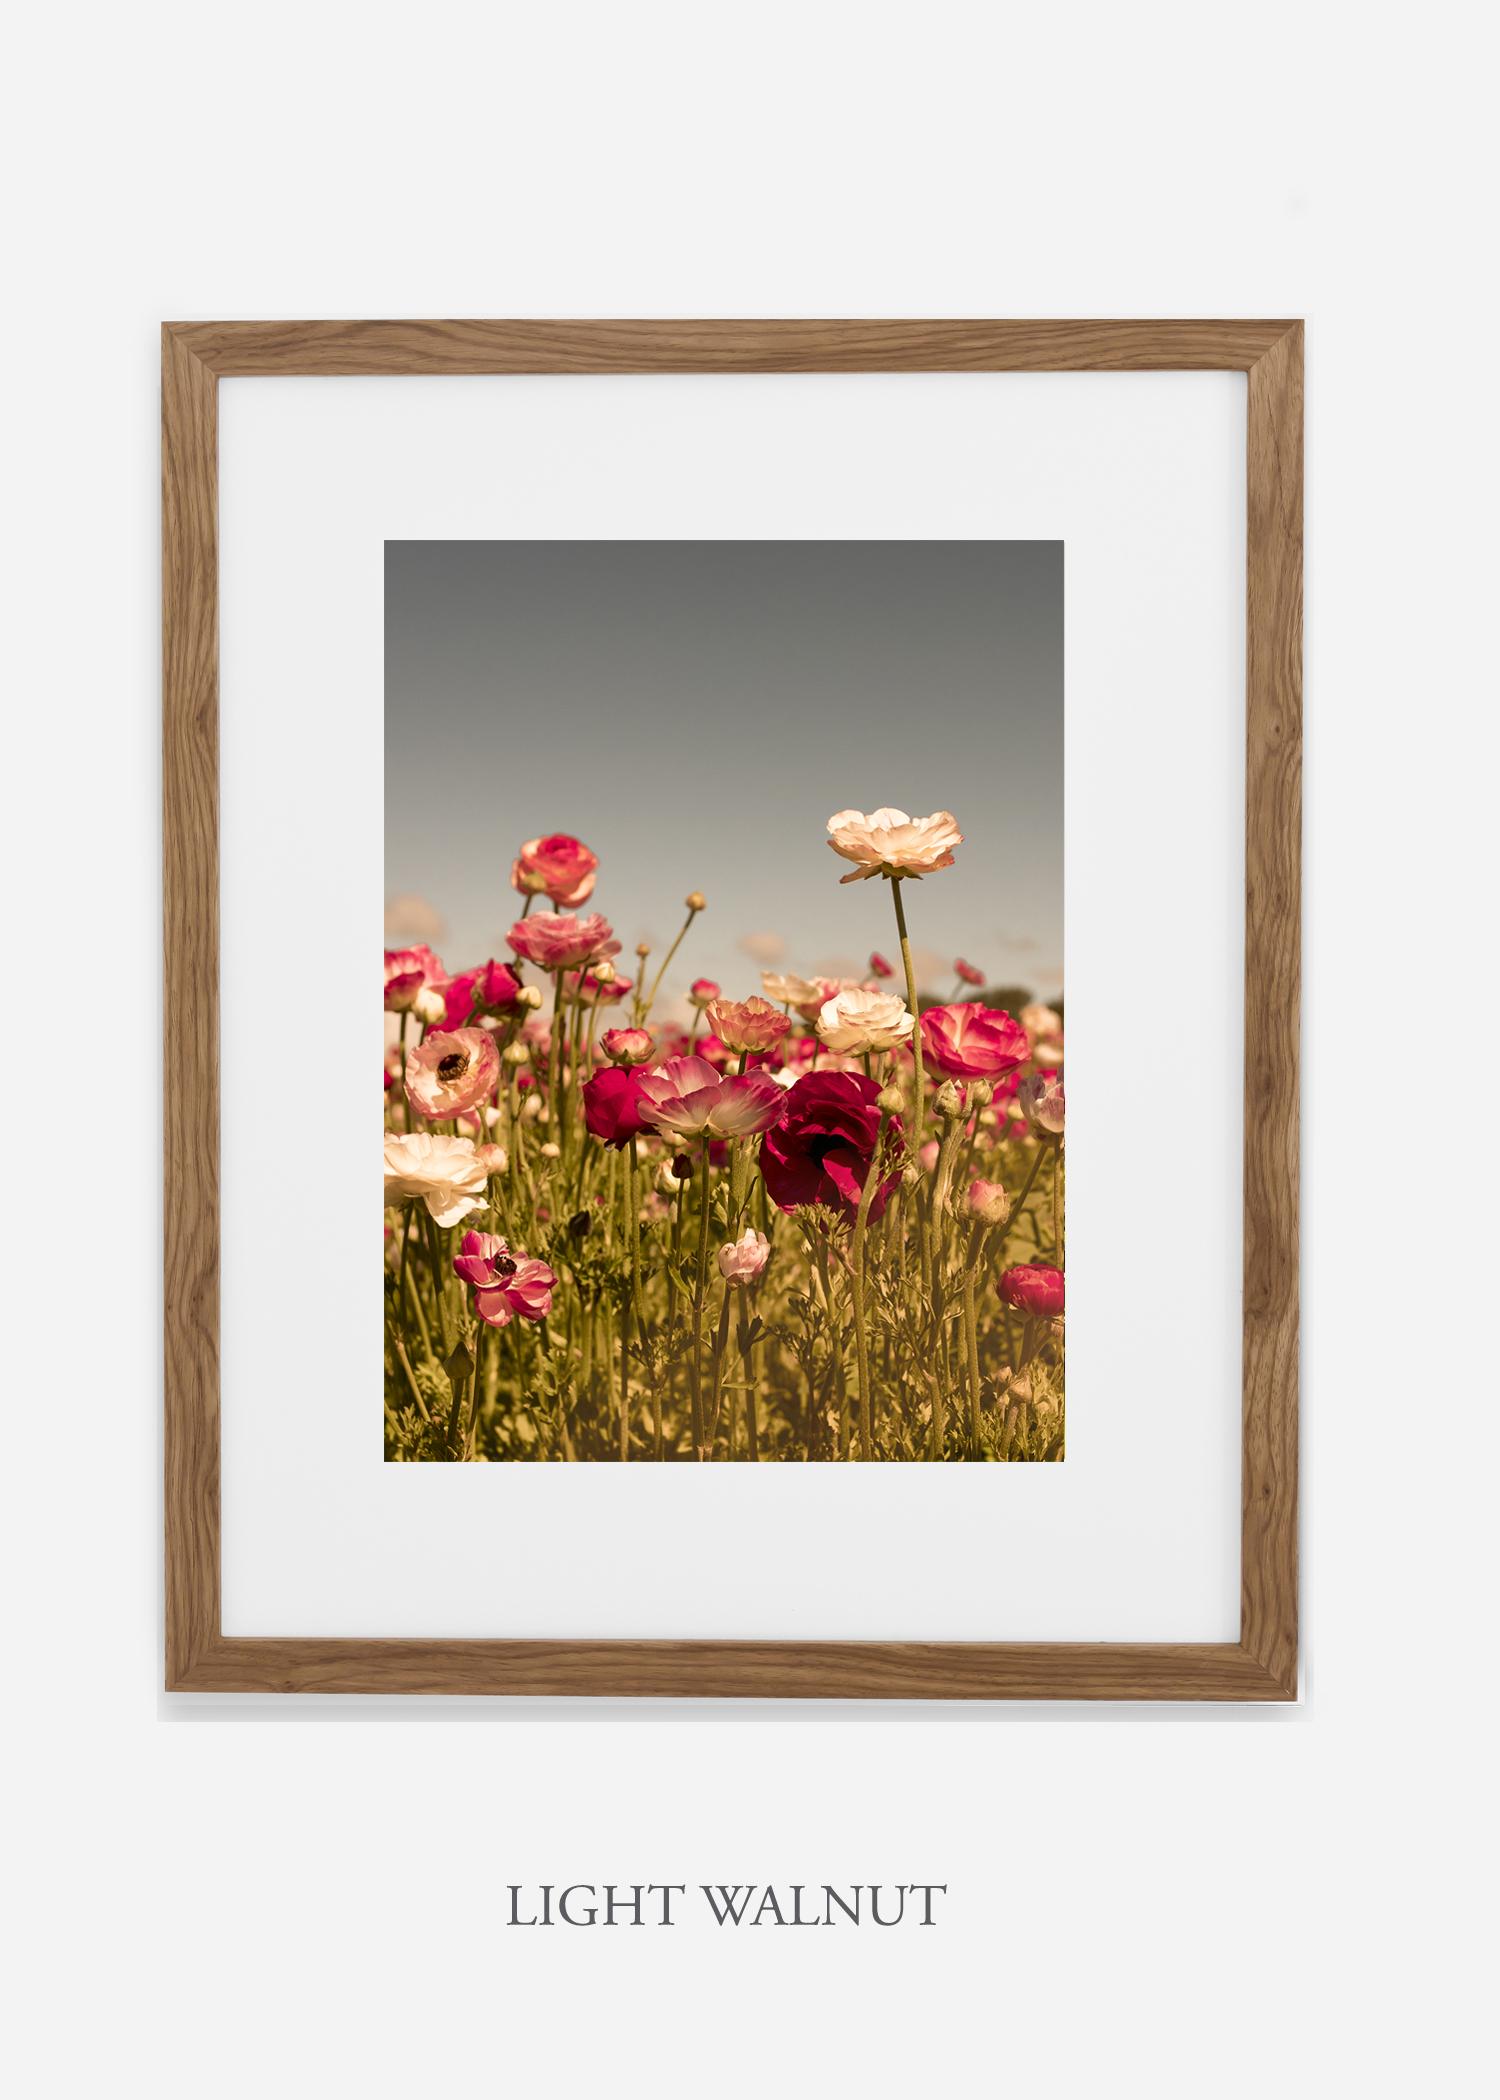 wilder-california-Floral-No.3-light-walnut-frame-mat-interior-design-botanical-print-art-floral-art.jpg